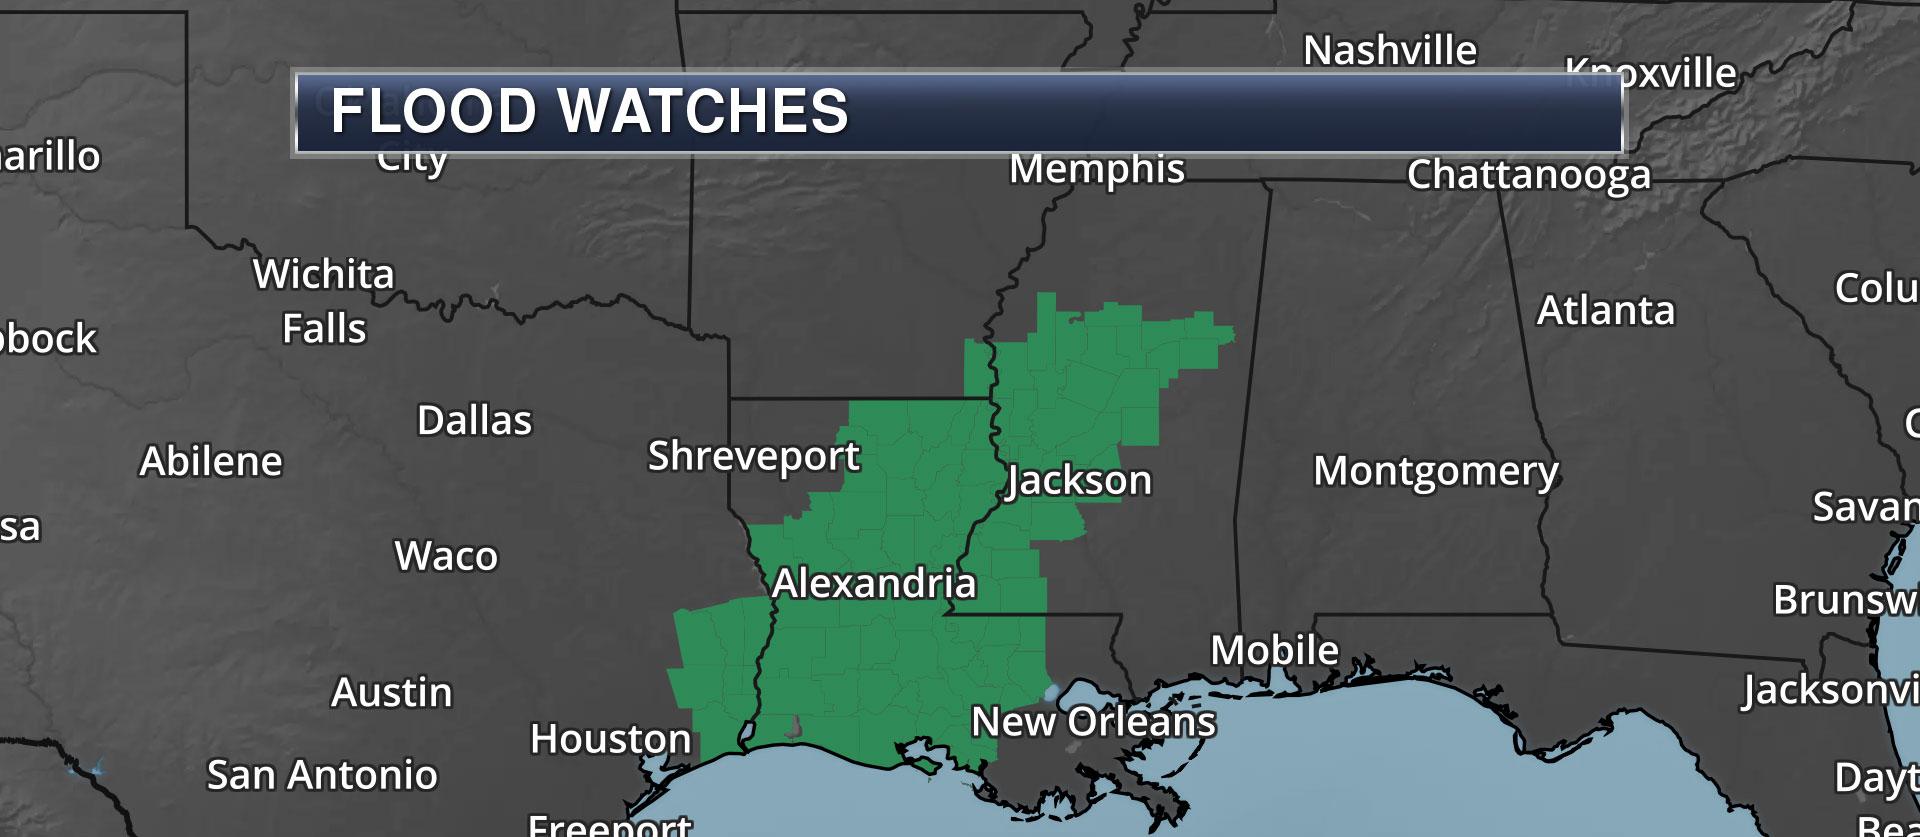 flood-watches-9.25-radar